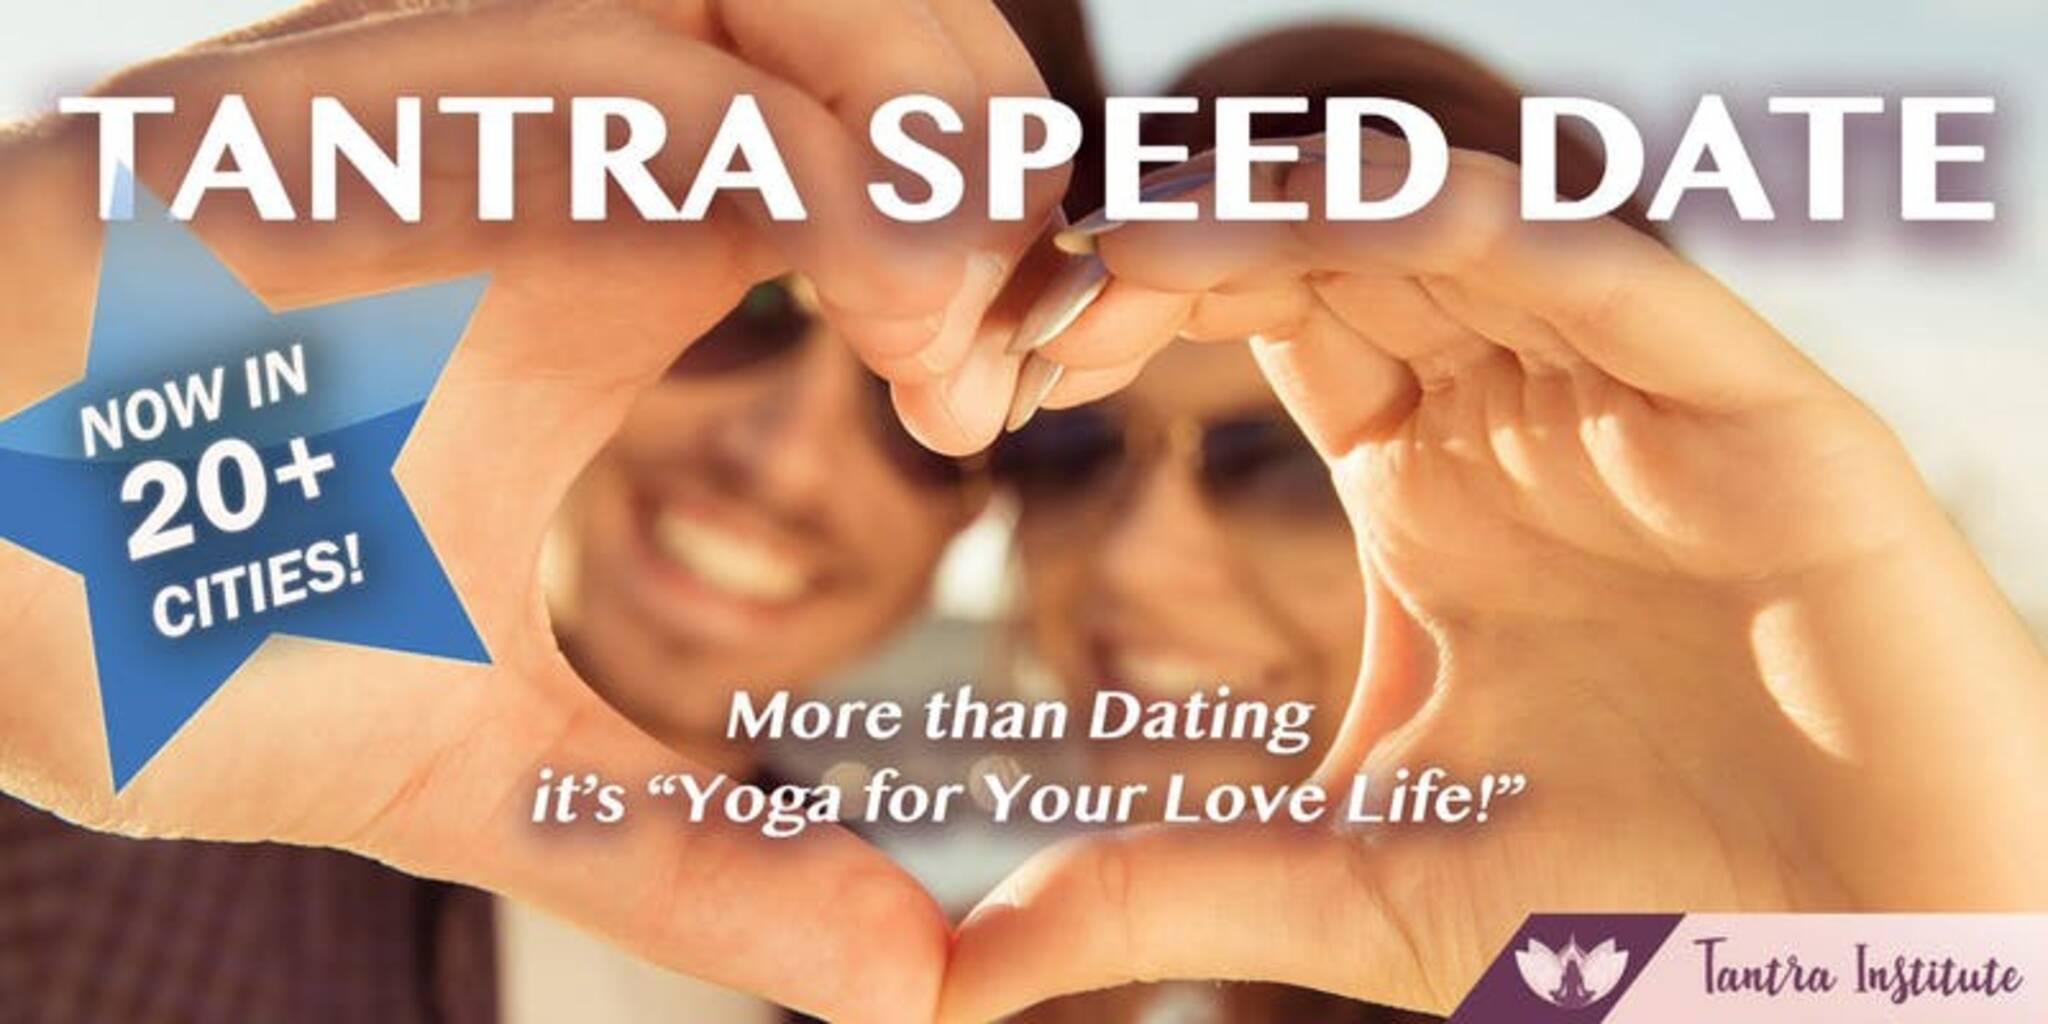 Toronto bedste dating site